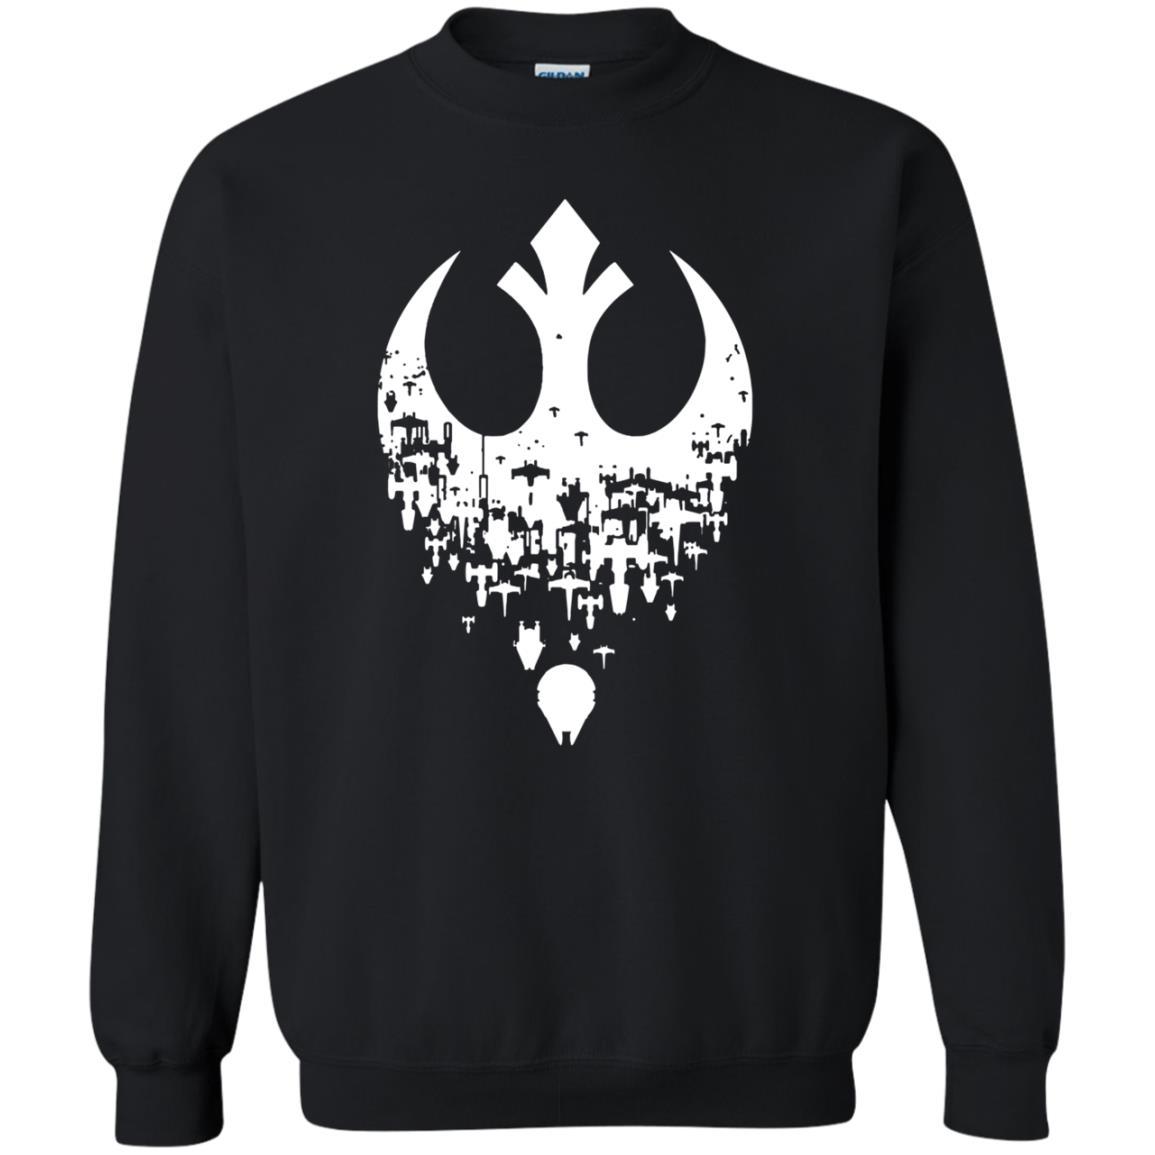 image 1505 - Star Wars Fractured Rebellion shirt, hoodie, tank